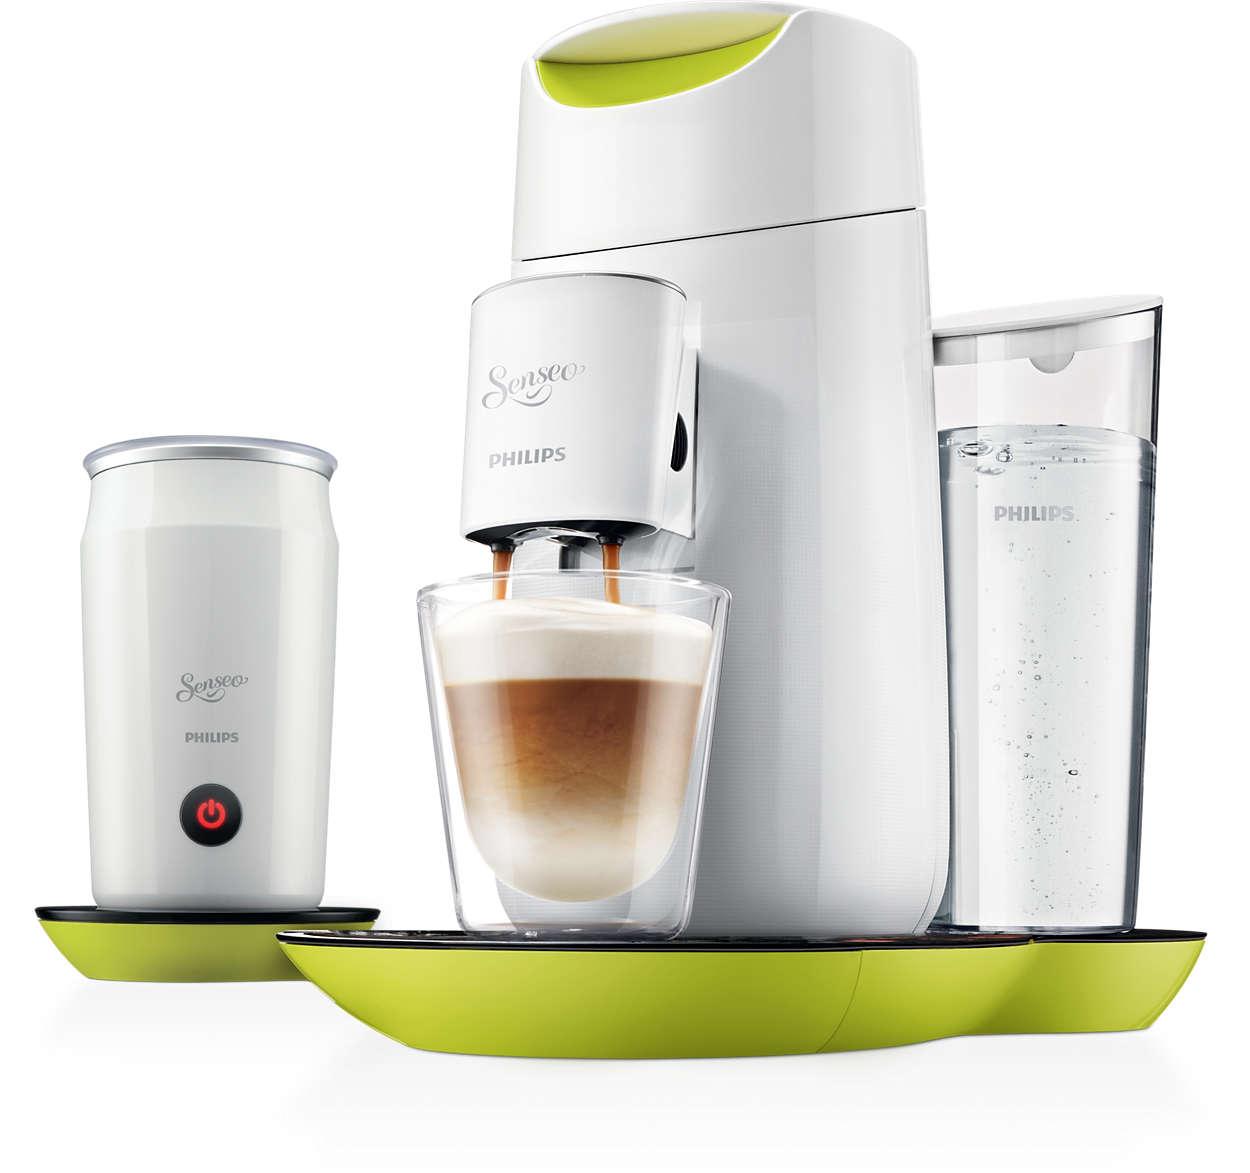 Tilbered din cappuccino, som du kan lide den